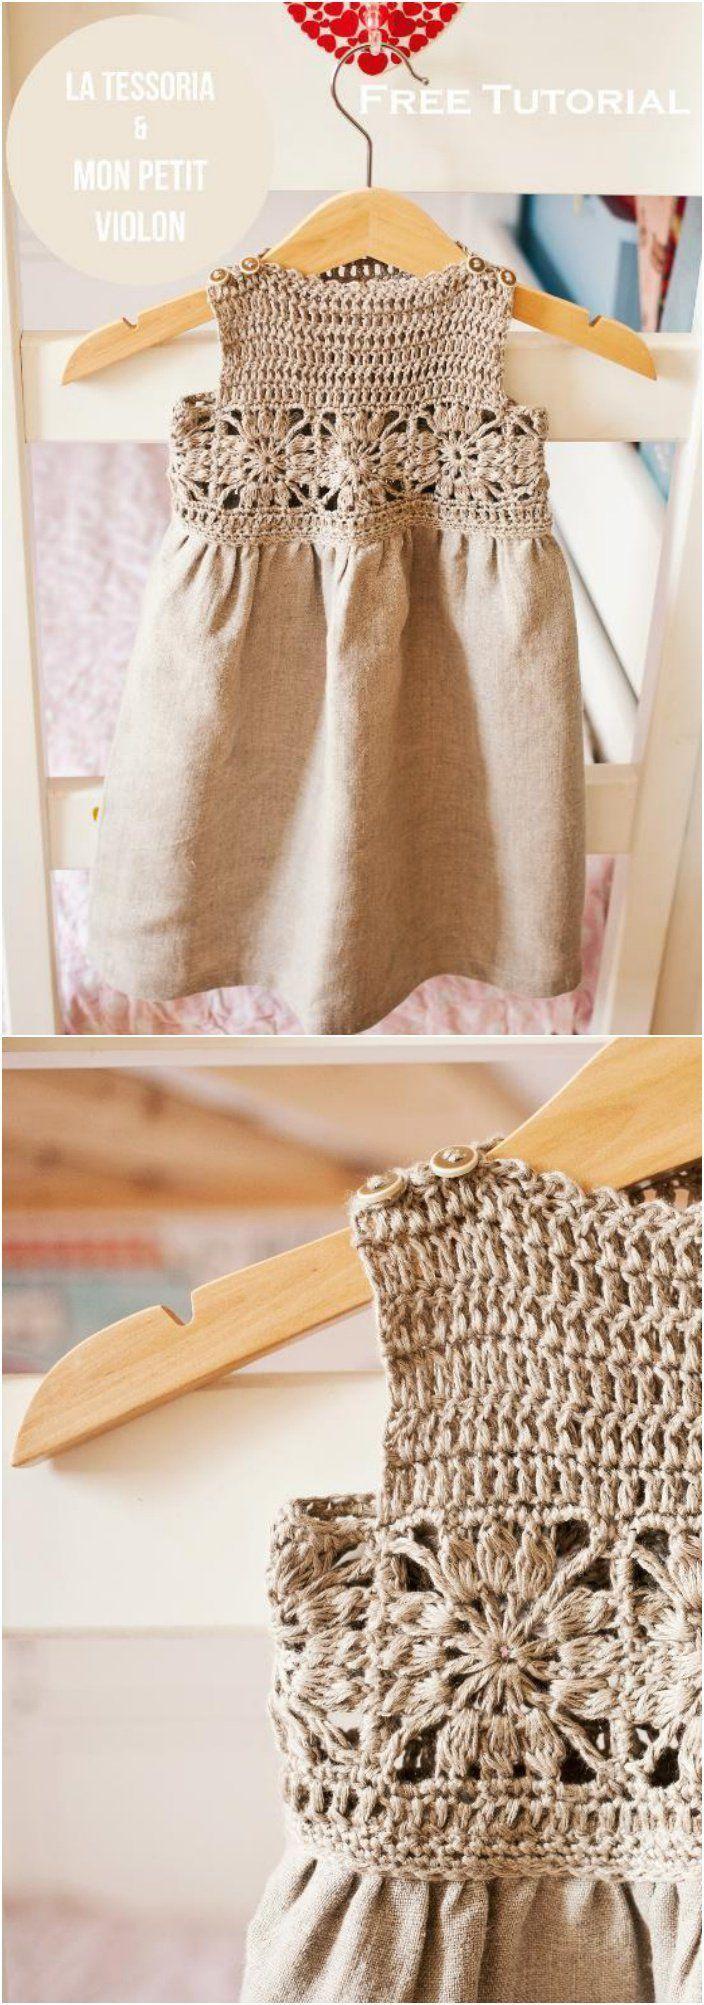 10+ Free Crochet and Fabric Dress Patterns   Lindo, Tela y Tejido